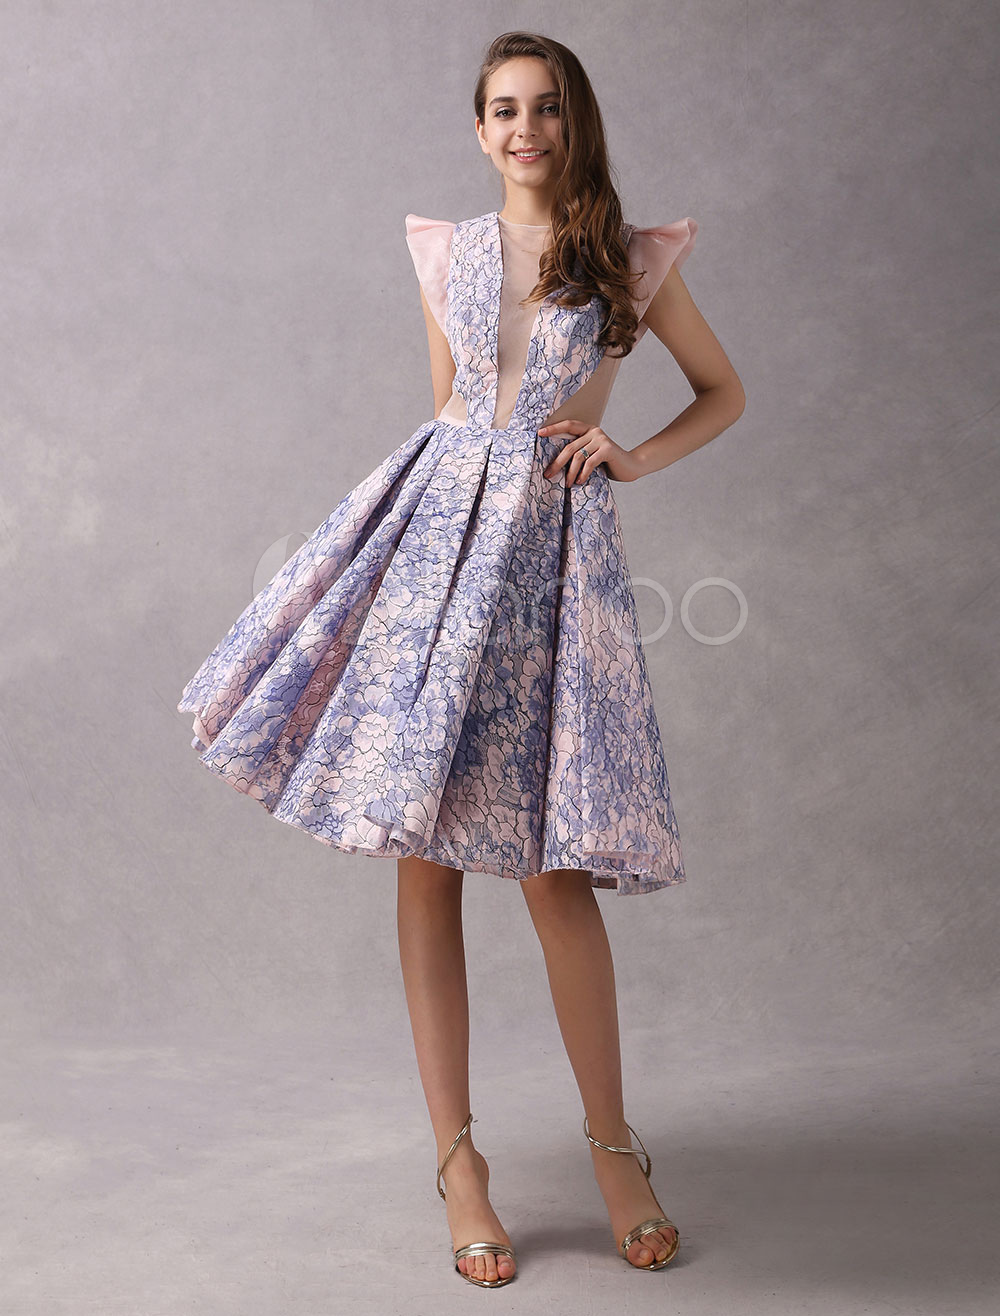 Cocktail Dresses Lace Short Party Dresses Soft Pink Organza Illusion Knee Length Graduation Dress (Wedding) photo